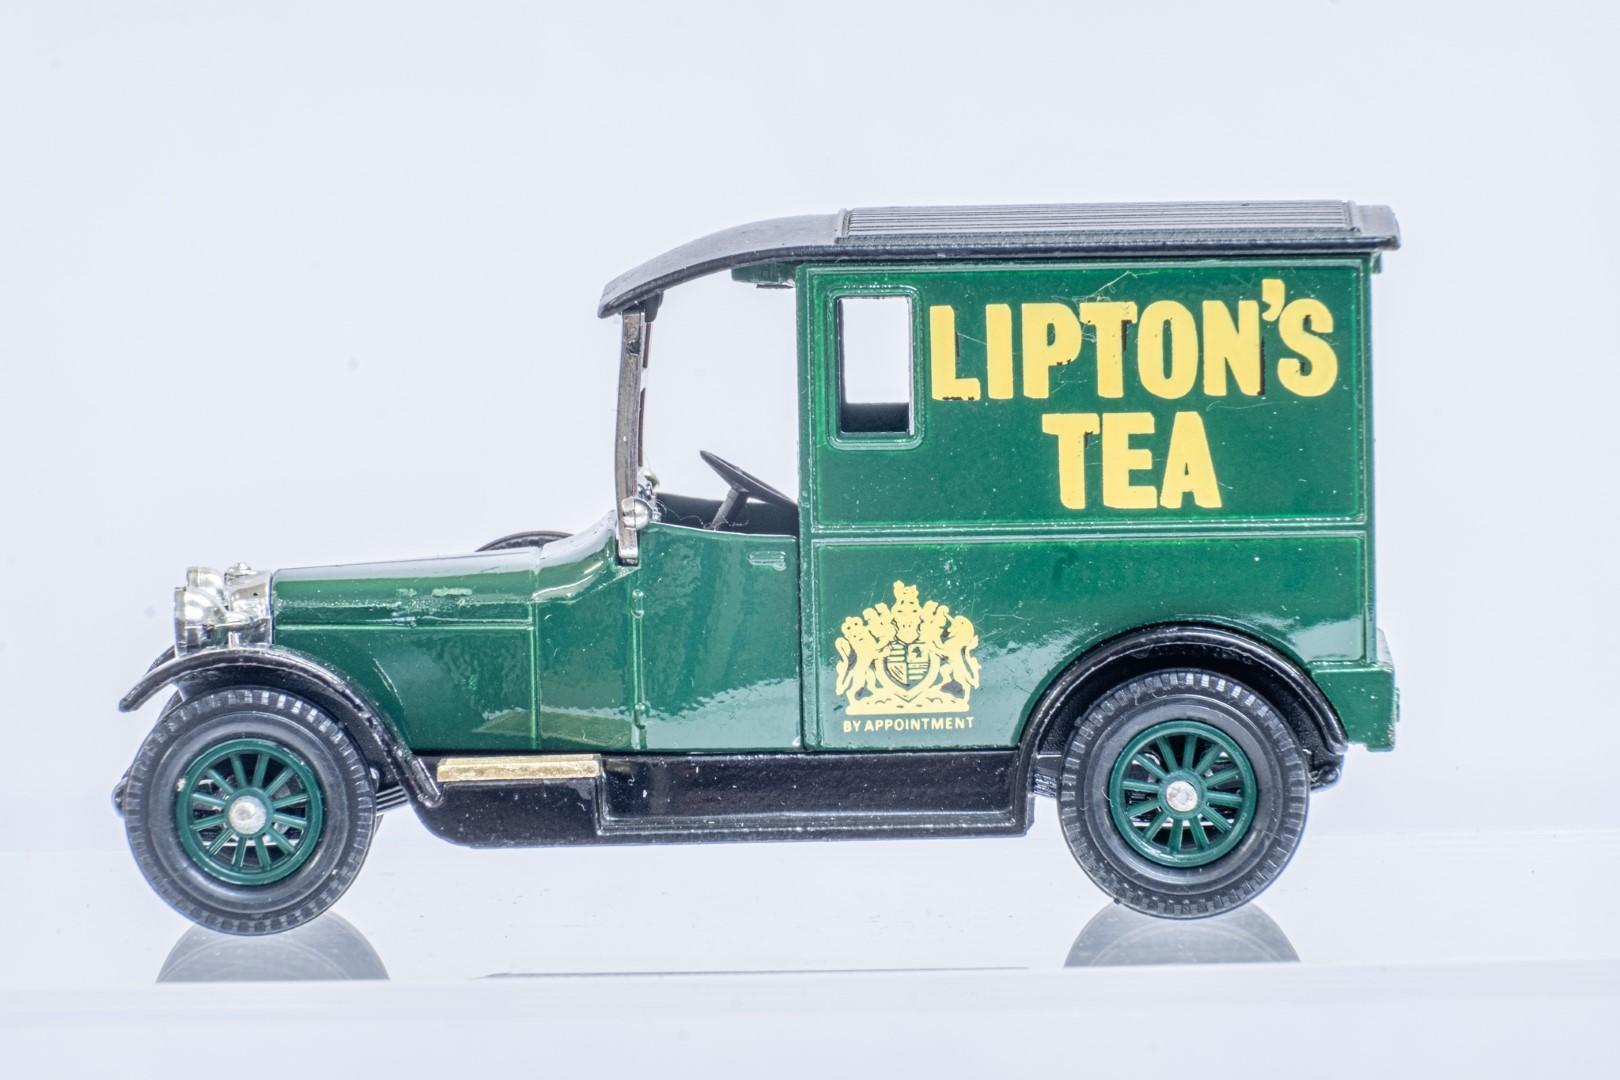 Matchbox 1927 Talbot Van Y-5 - Liptions Tea - Rare - Image 5 of 9